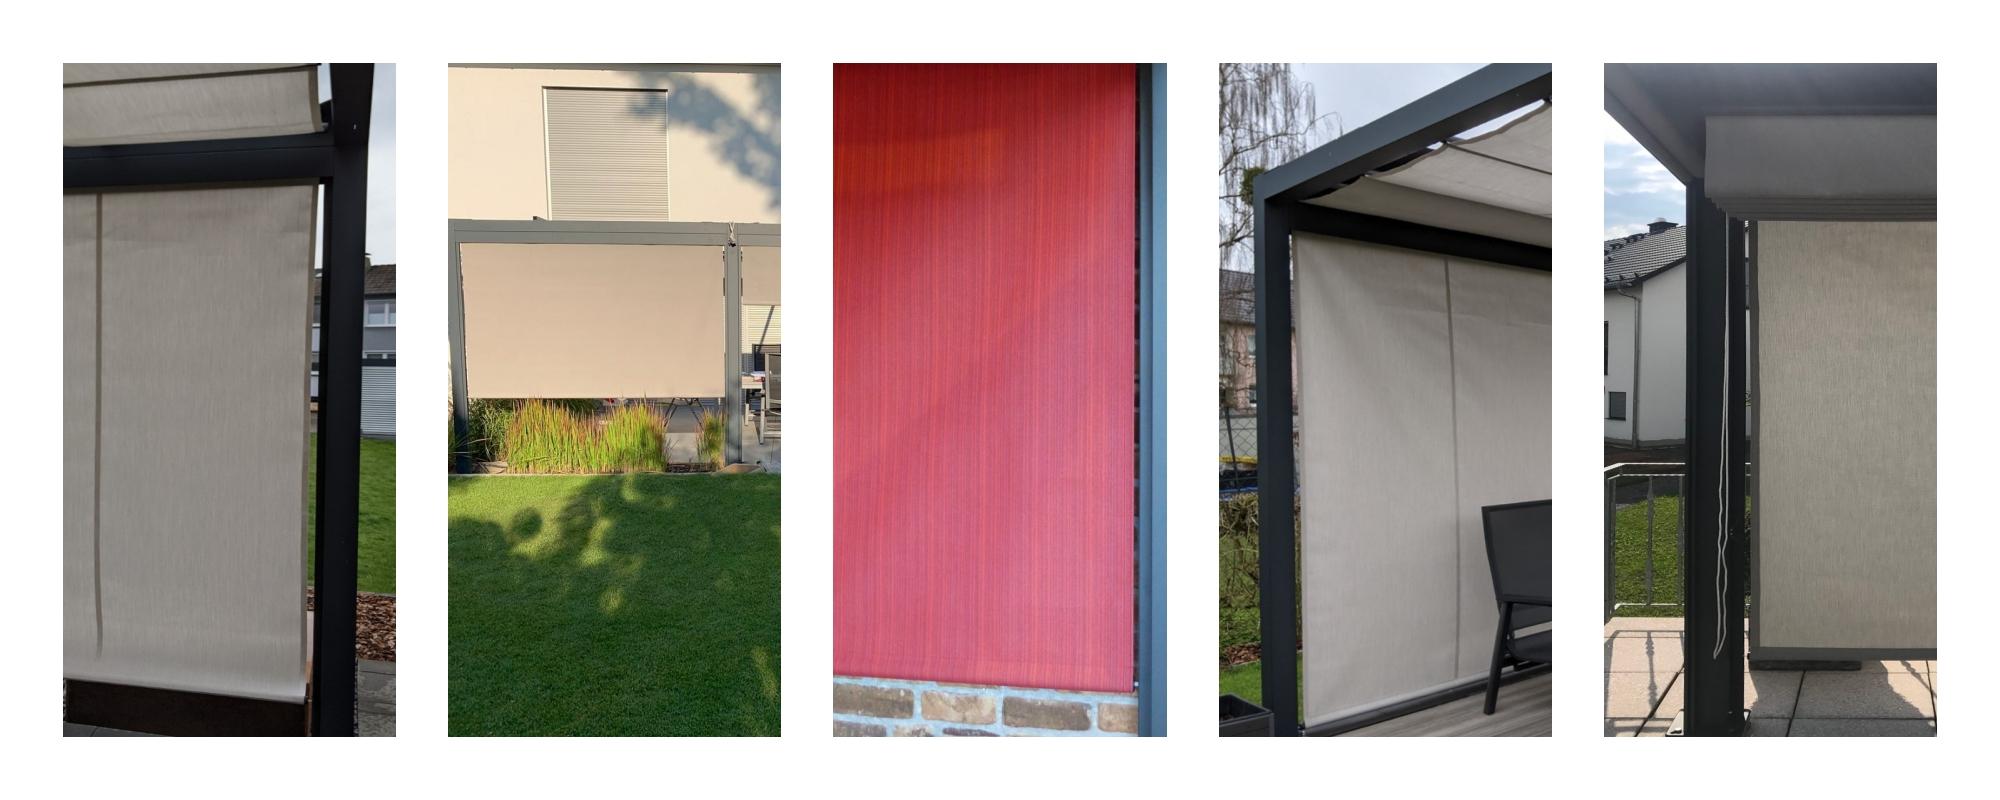 Seitenmarkise-Sonnenpavillon-Markisen-made-in-germany-8Ajb17KQVSuIlv